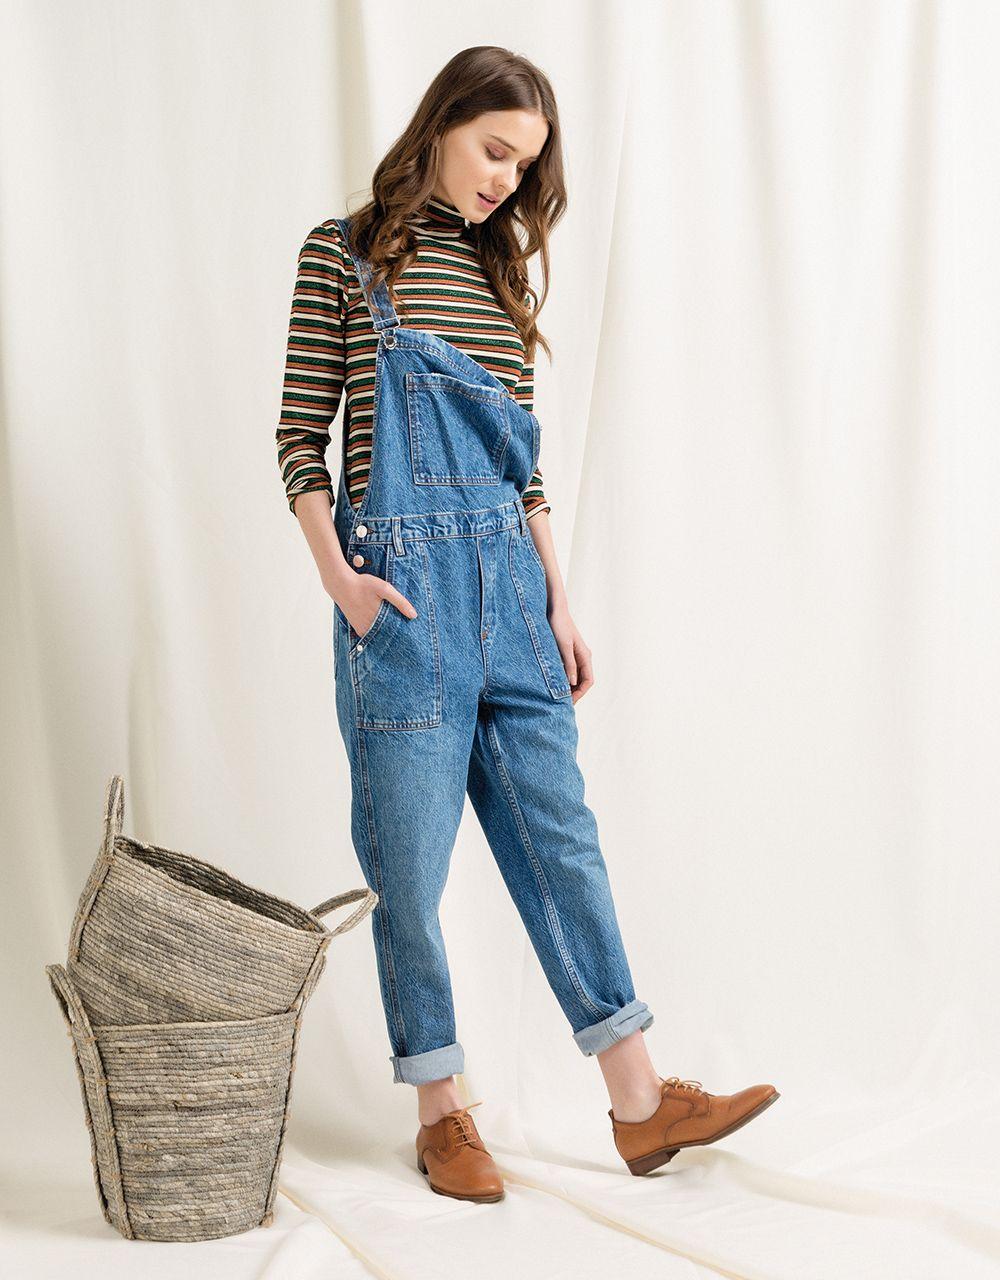 denim-on-denim-outfit